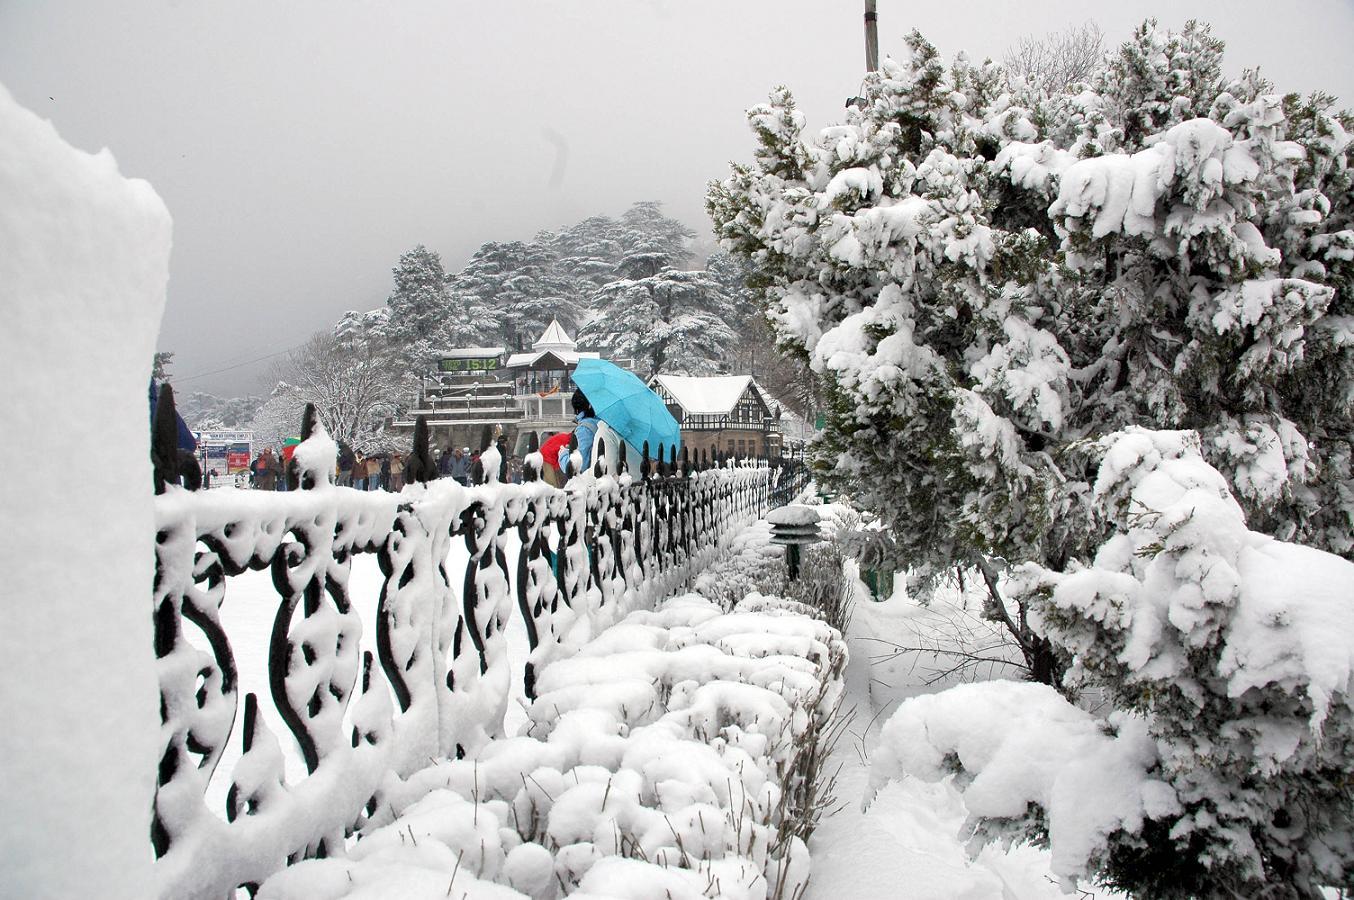 8-feb-snowfall-07.jpg